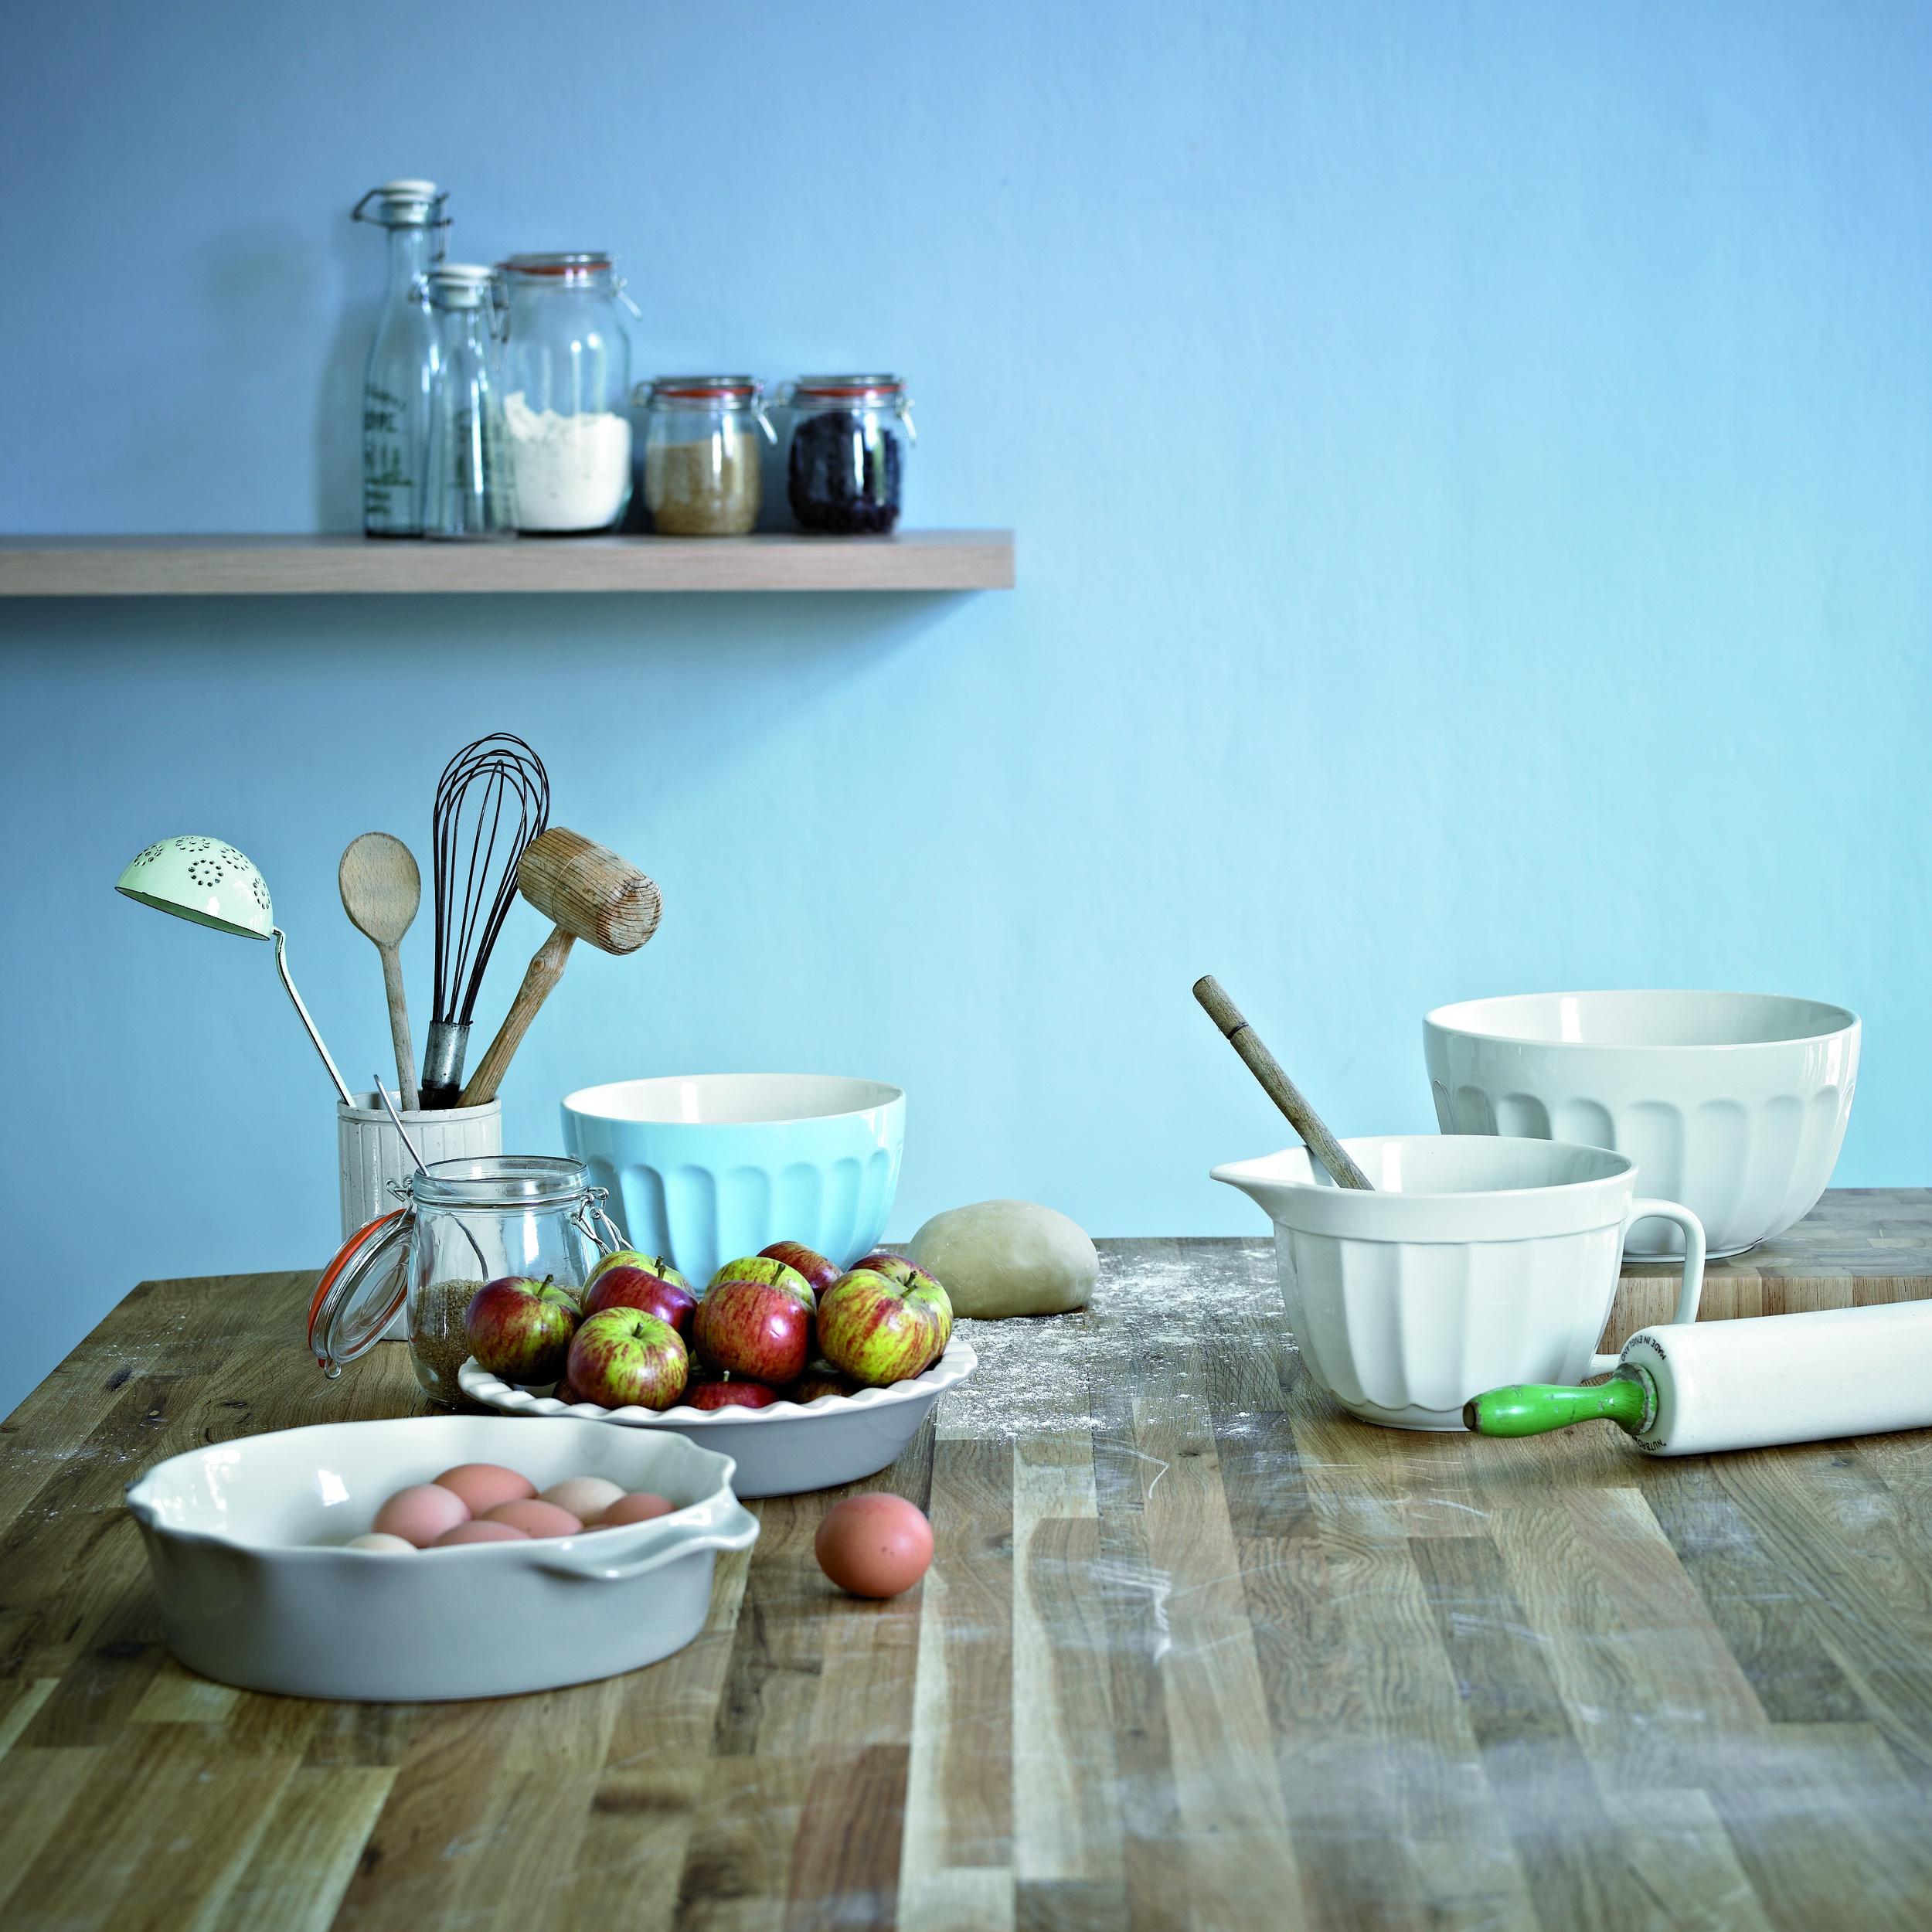 Oak kitchen bakeware image.jpg